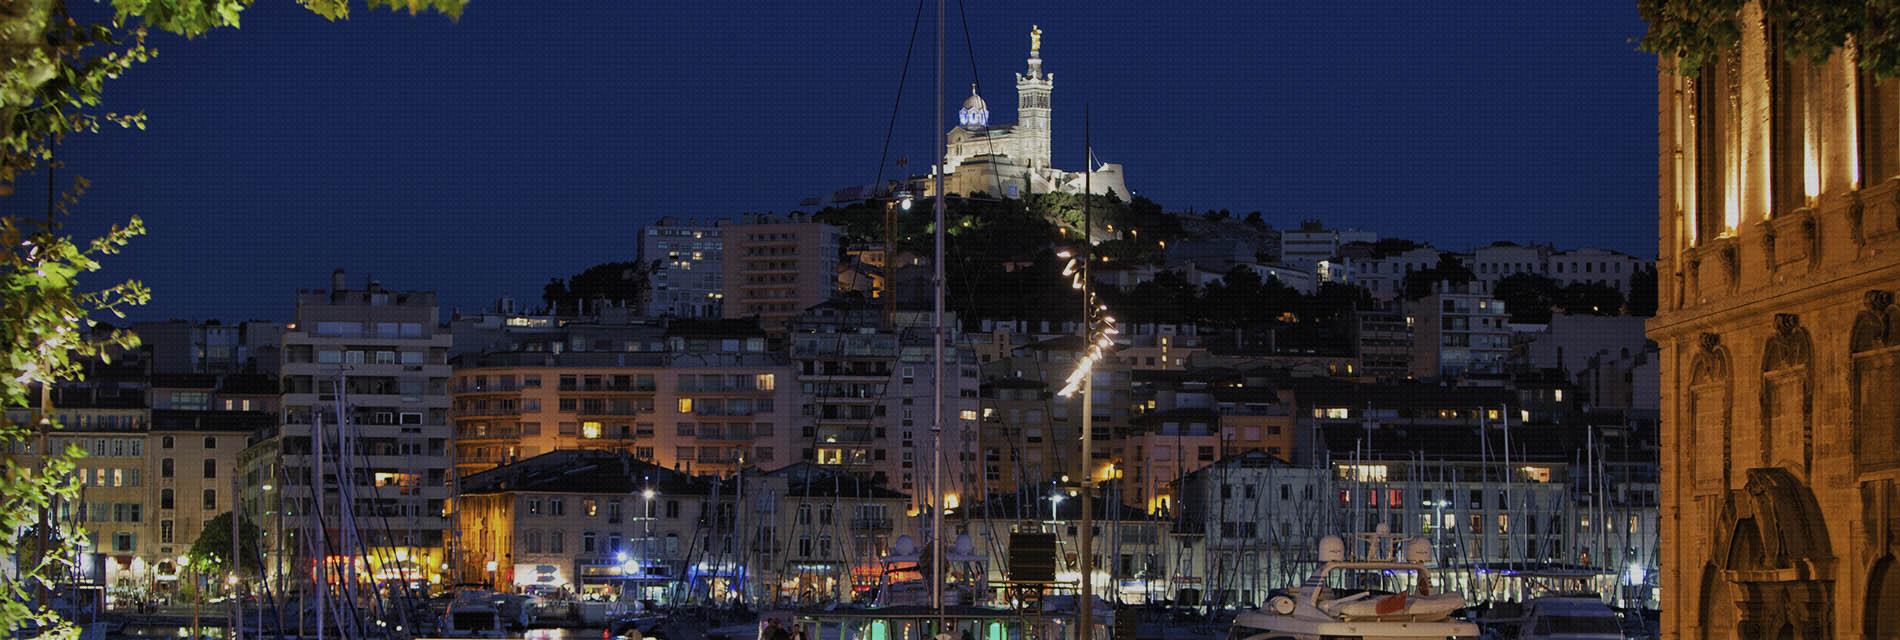 Navette Gare de Marseille Saint Charles - Marseille